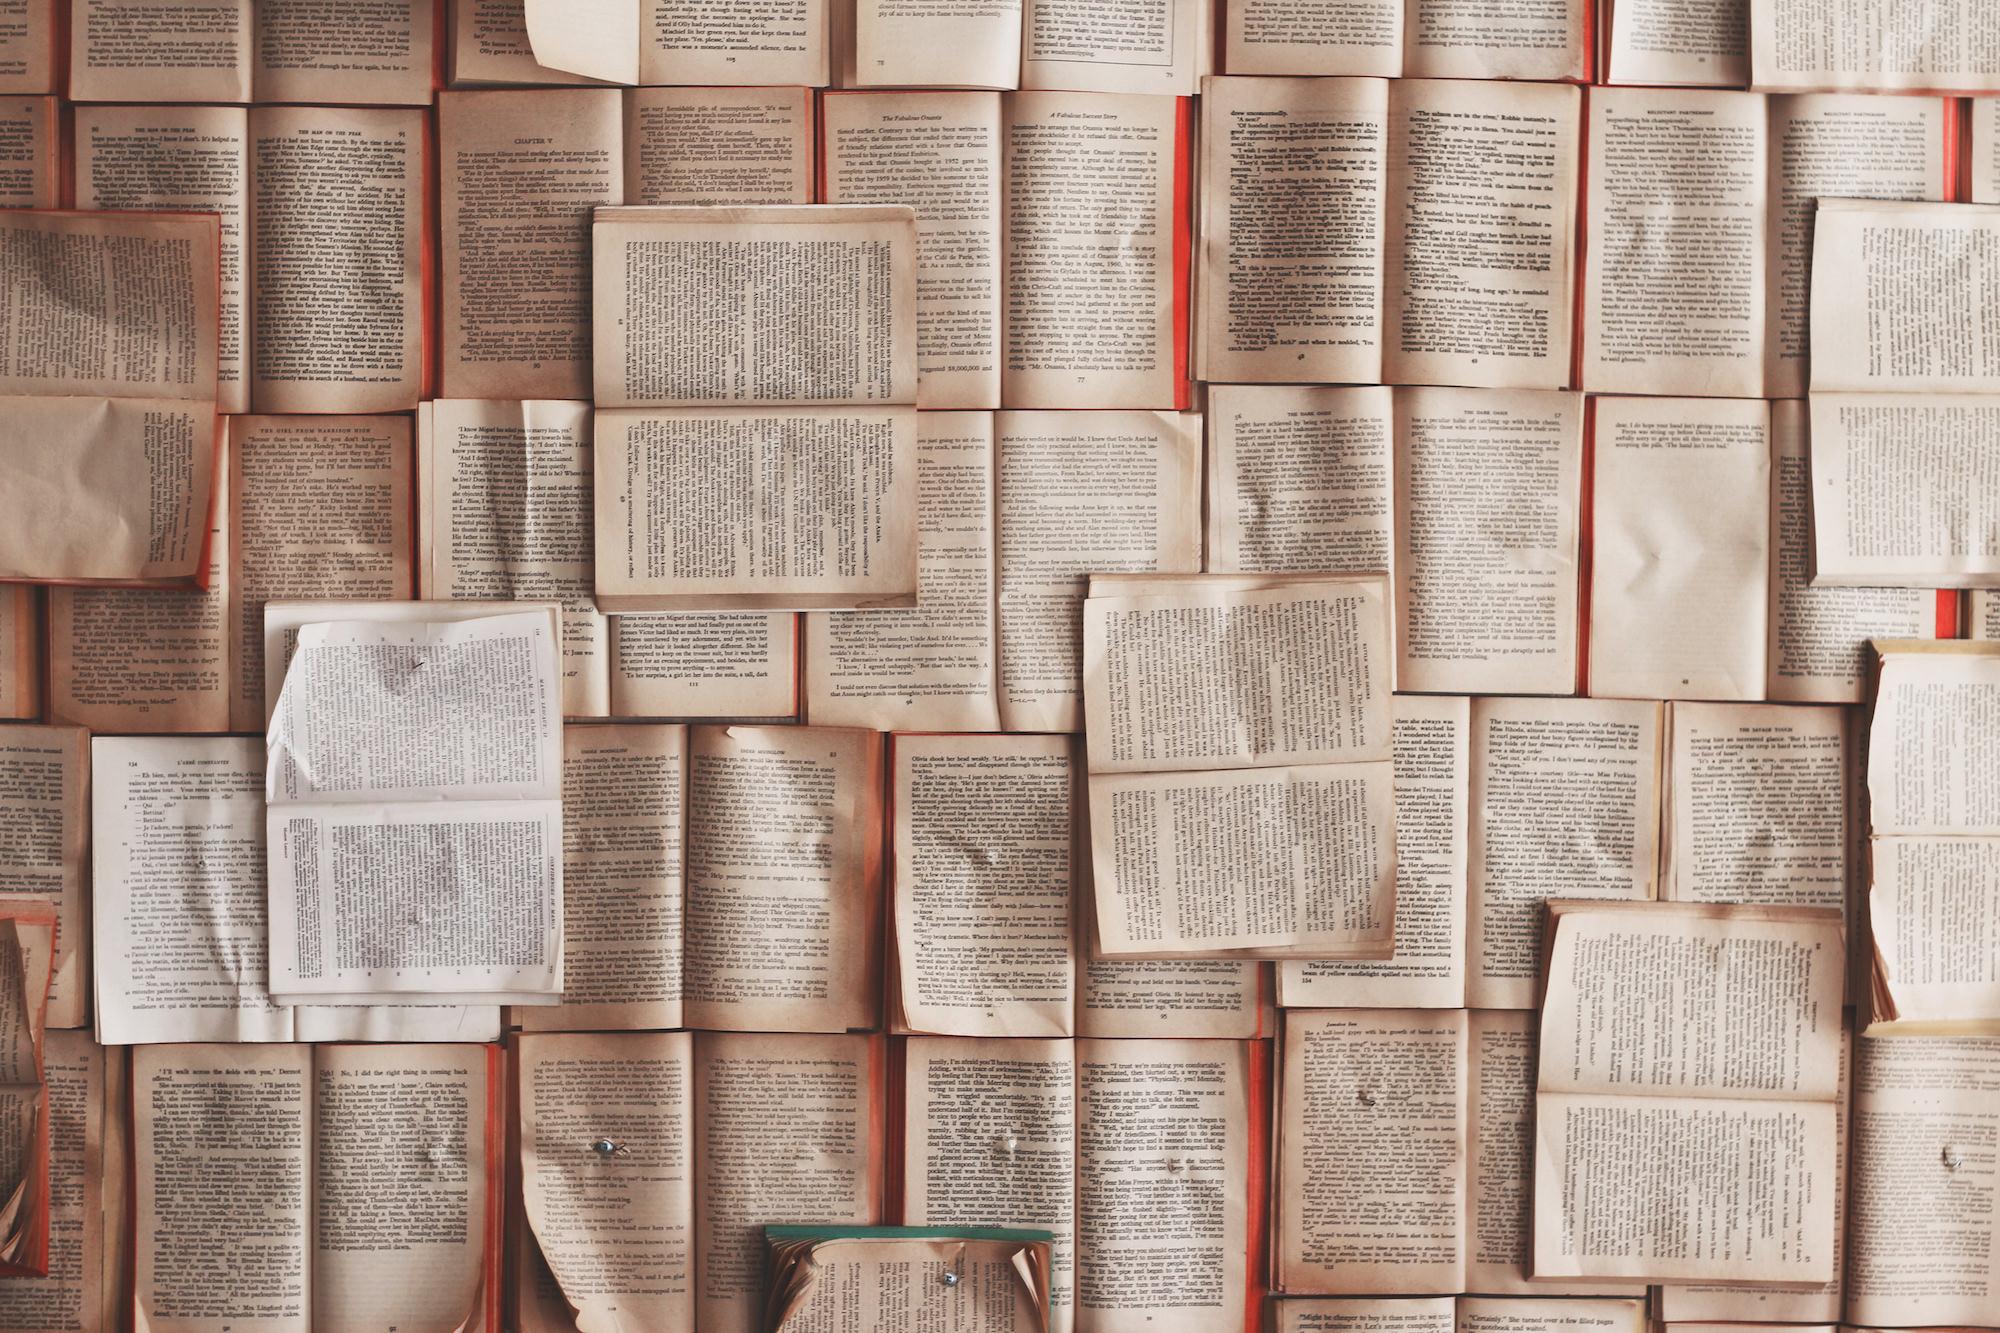 Display of books.